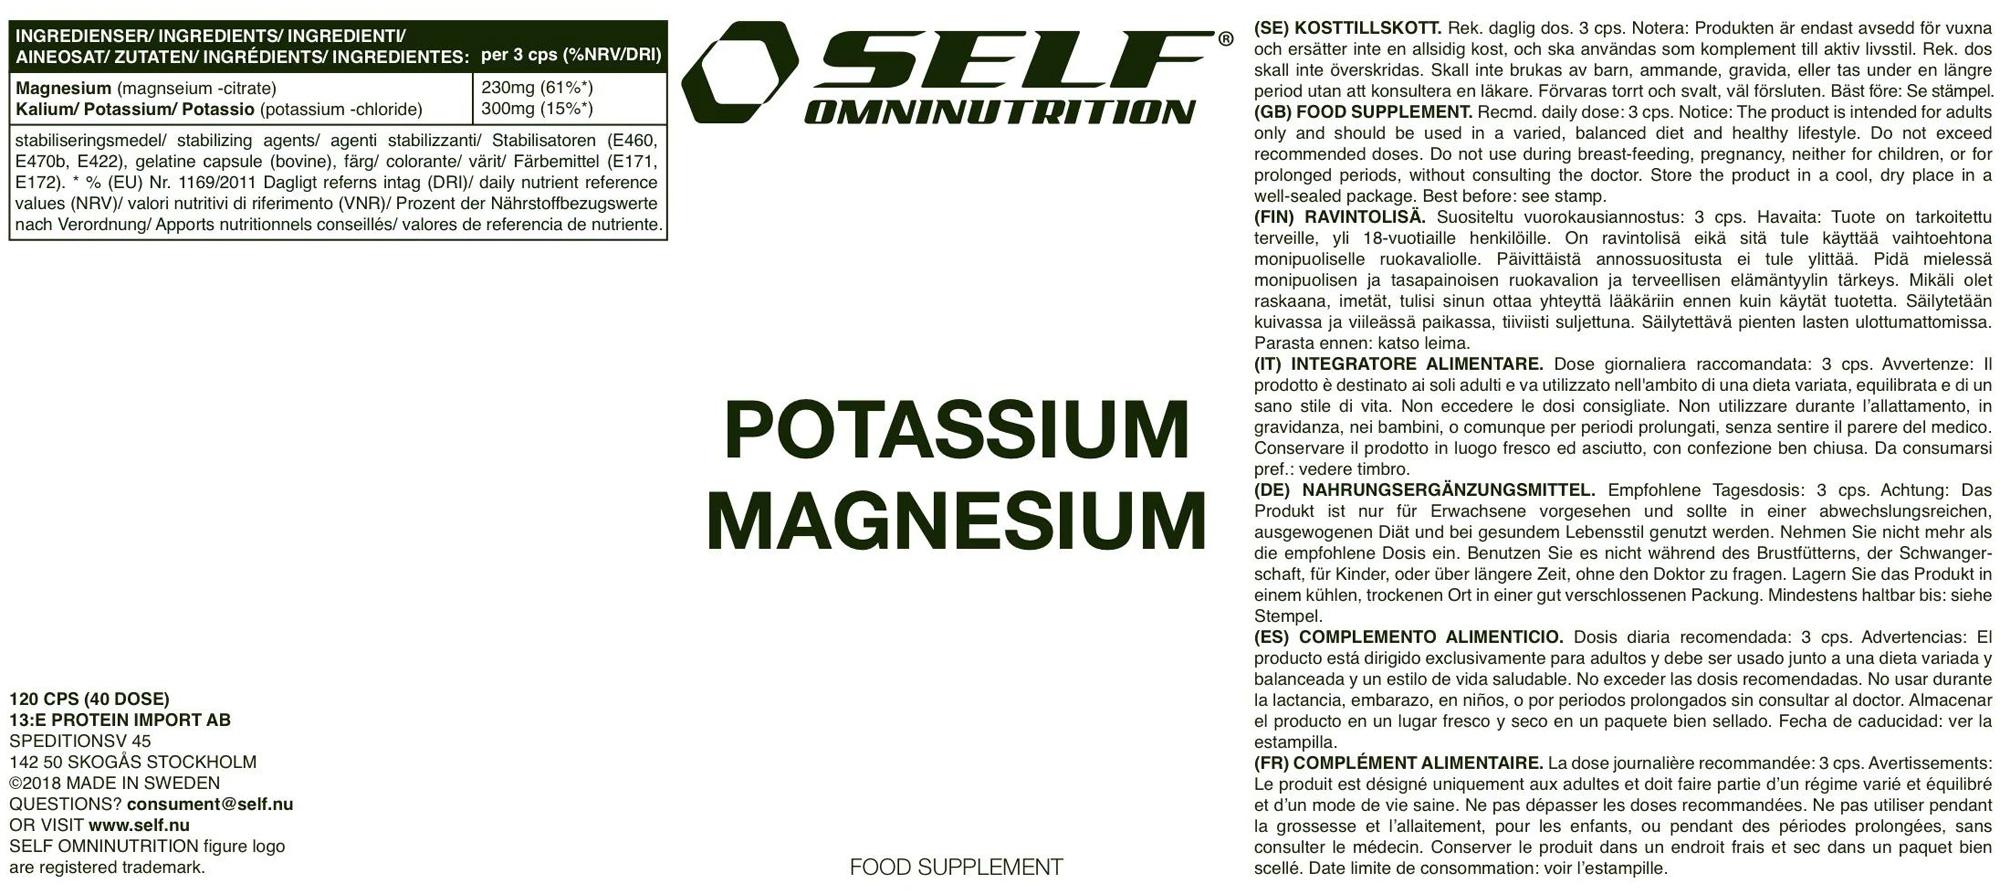 self-omninutrition-potassium-magnesium-info